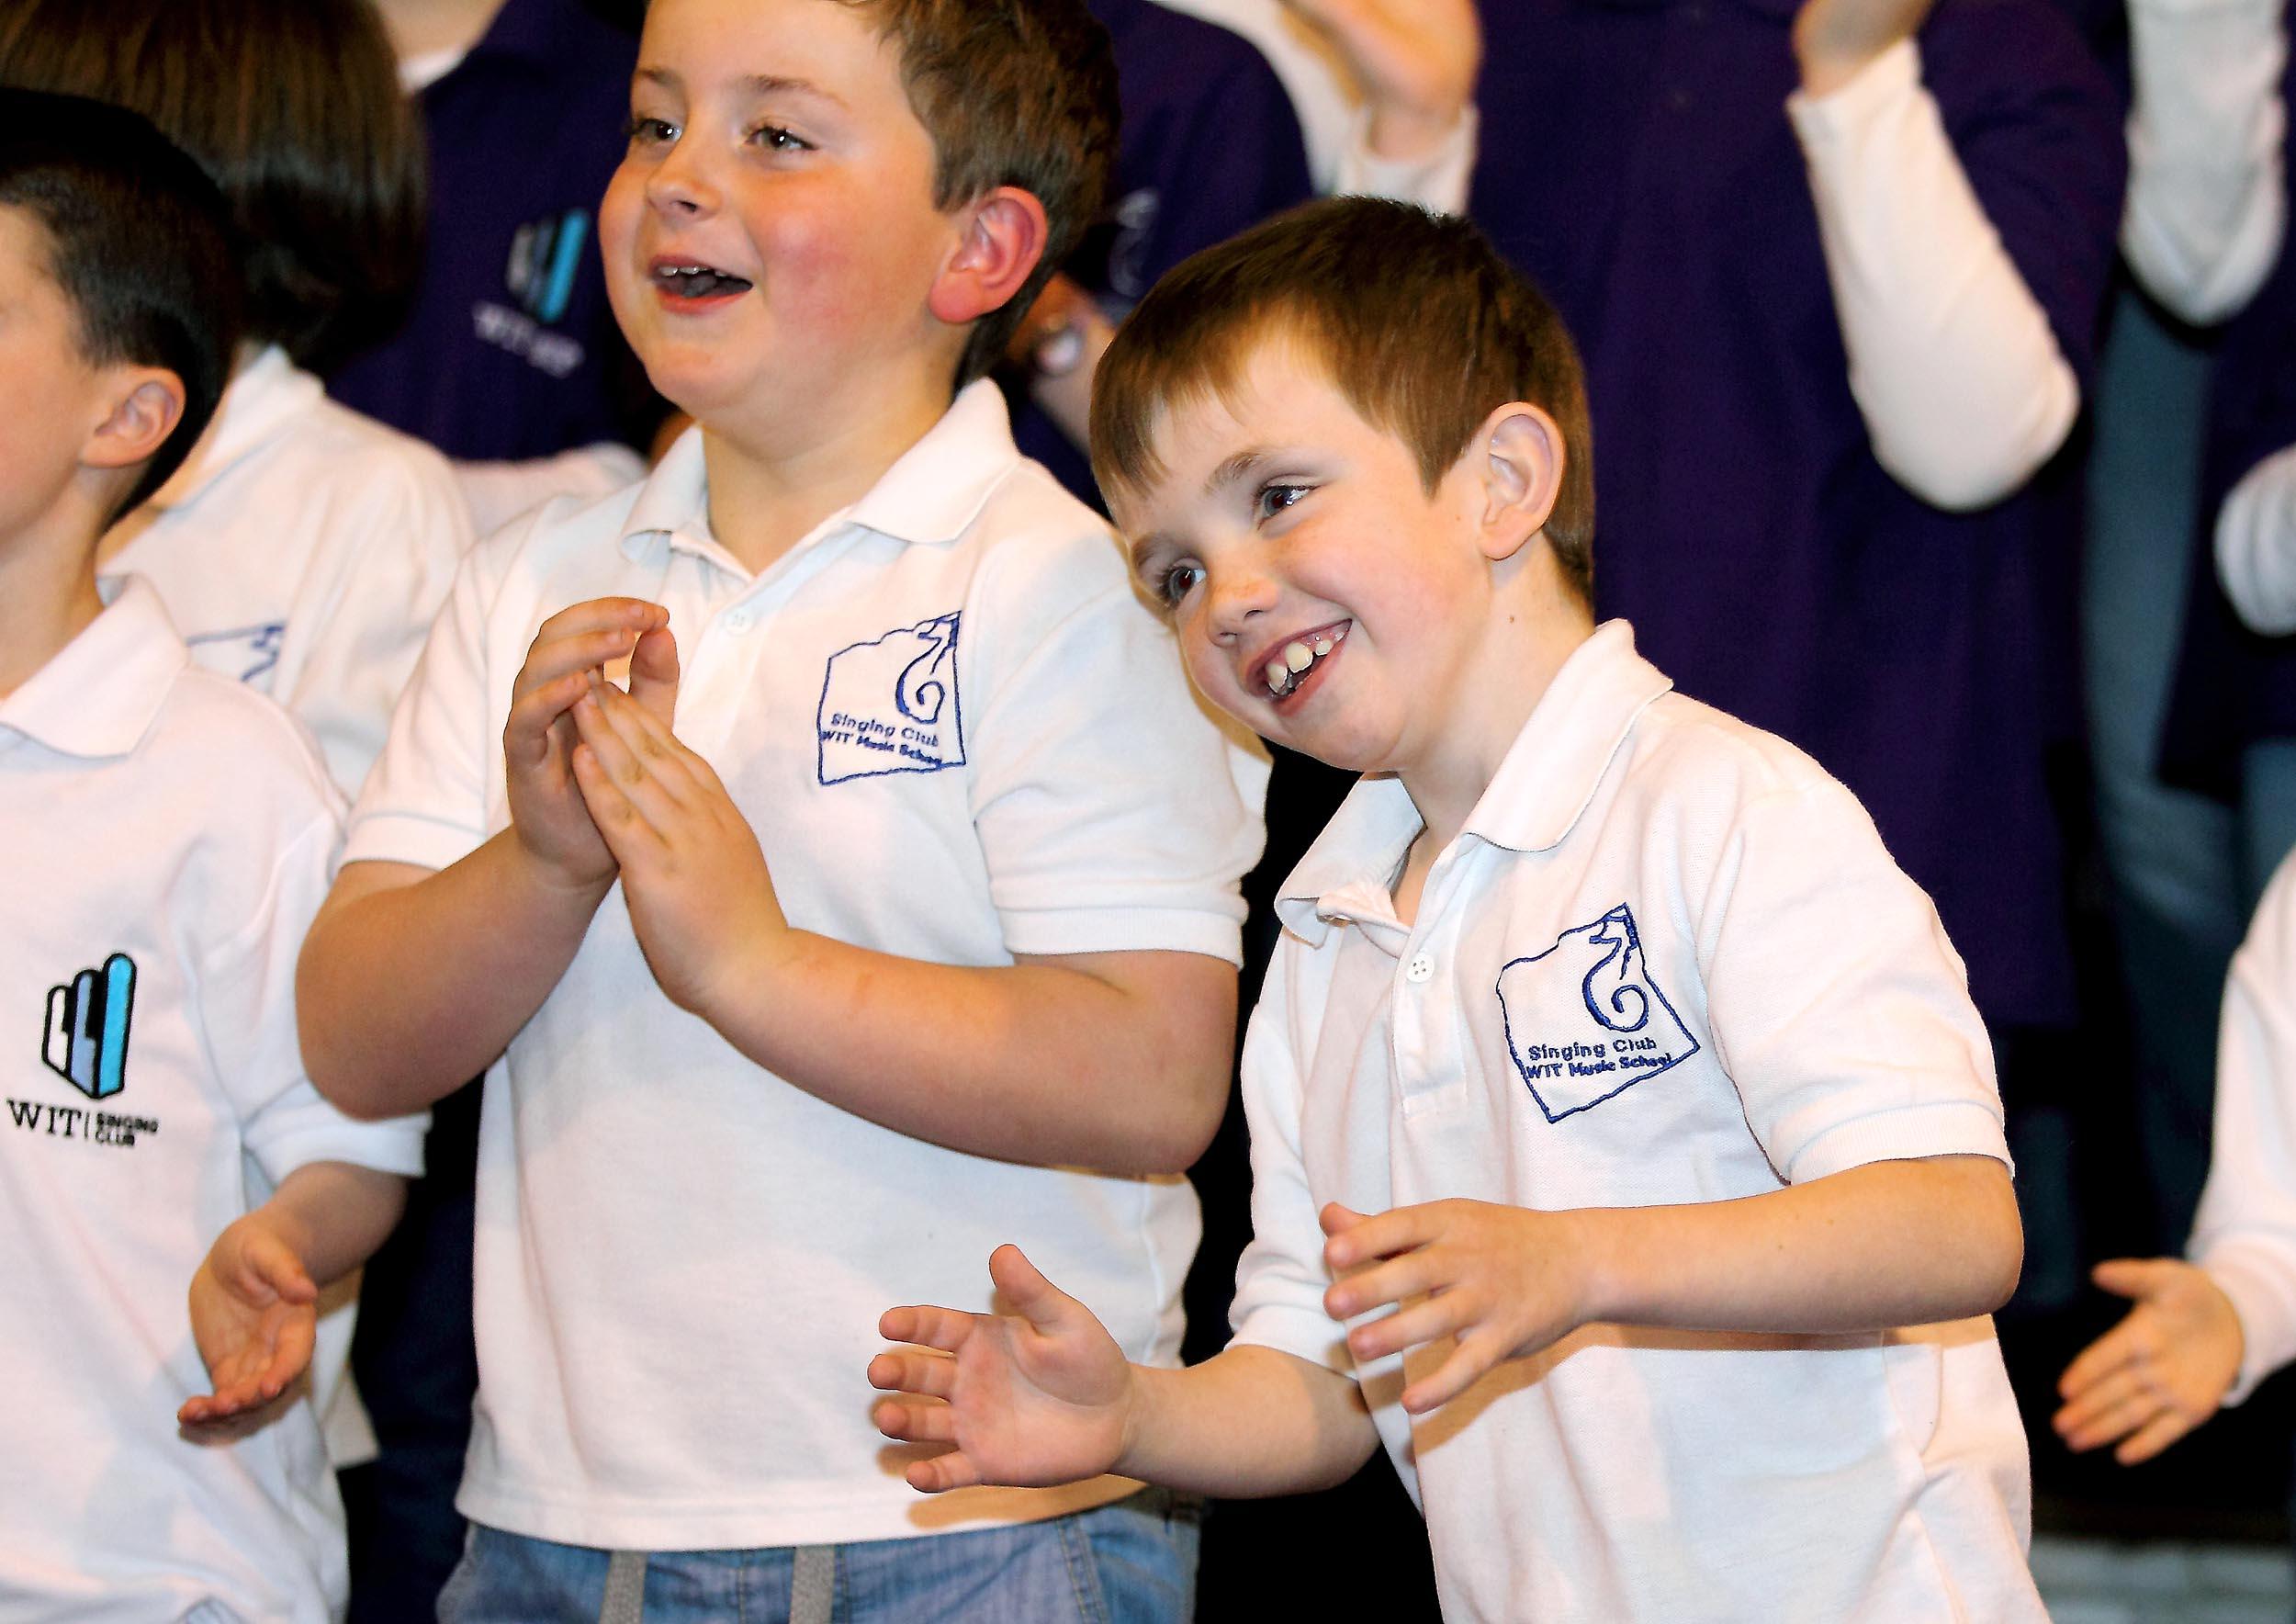 WIT Singing Club - WIT Choirs